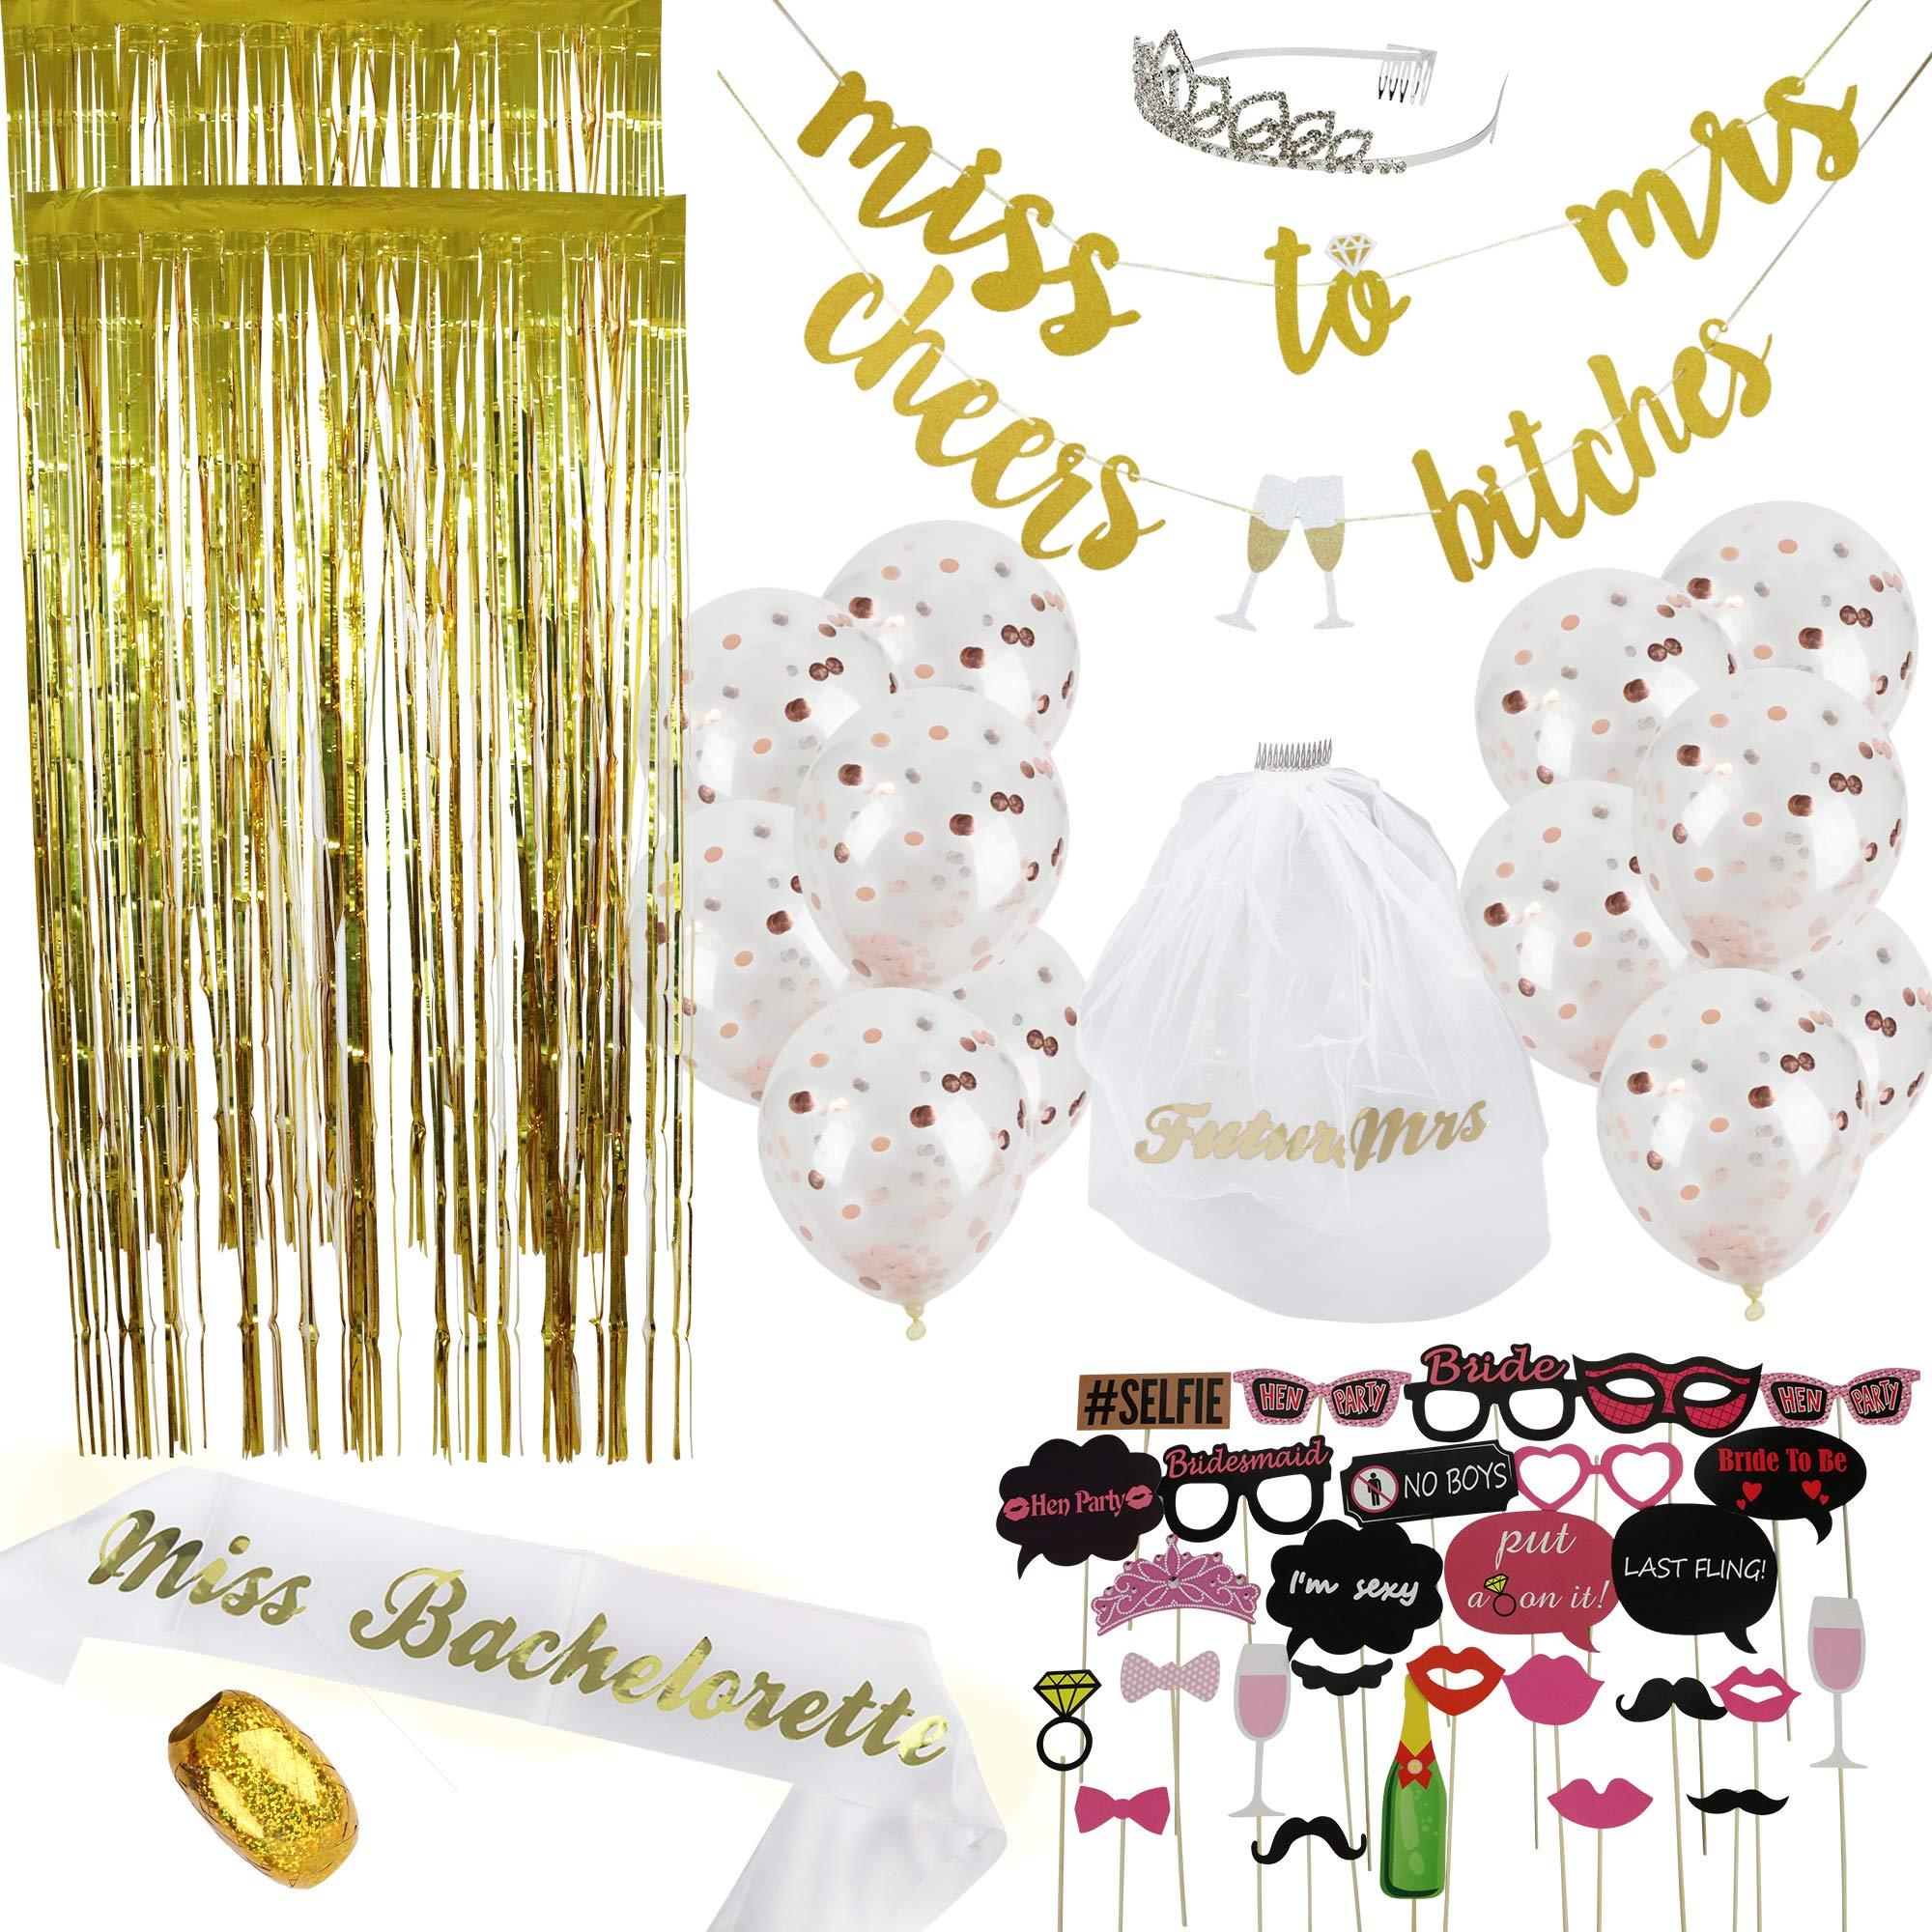 Bachelorette Party Decorations Kit 50 Piece   Bridal Shower Supplies   Photo Props & Backdrop Set - Gold Banners, Gold Photo Backdrops, Confetti Balloons, Photo Props, Sash, Tiara, Veil, Ribbon